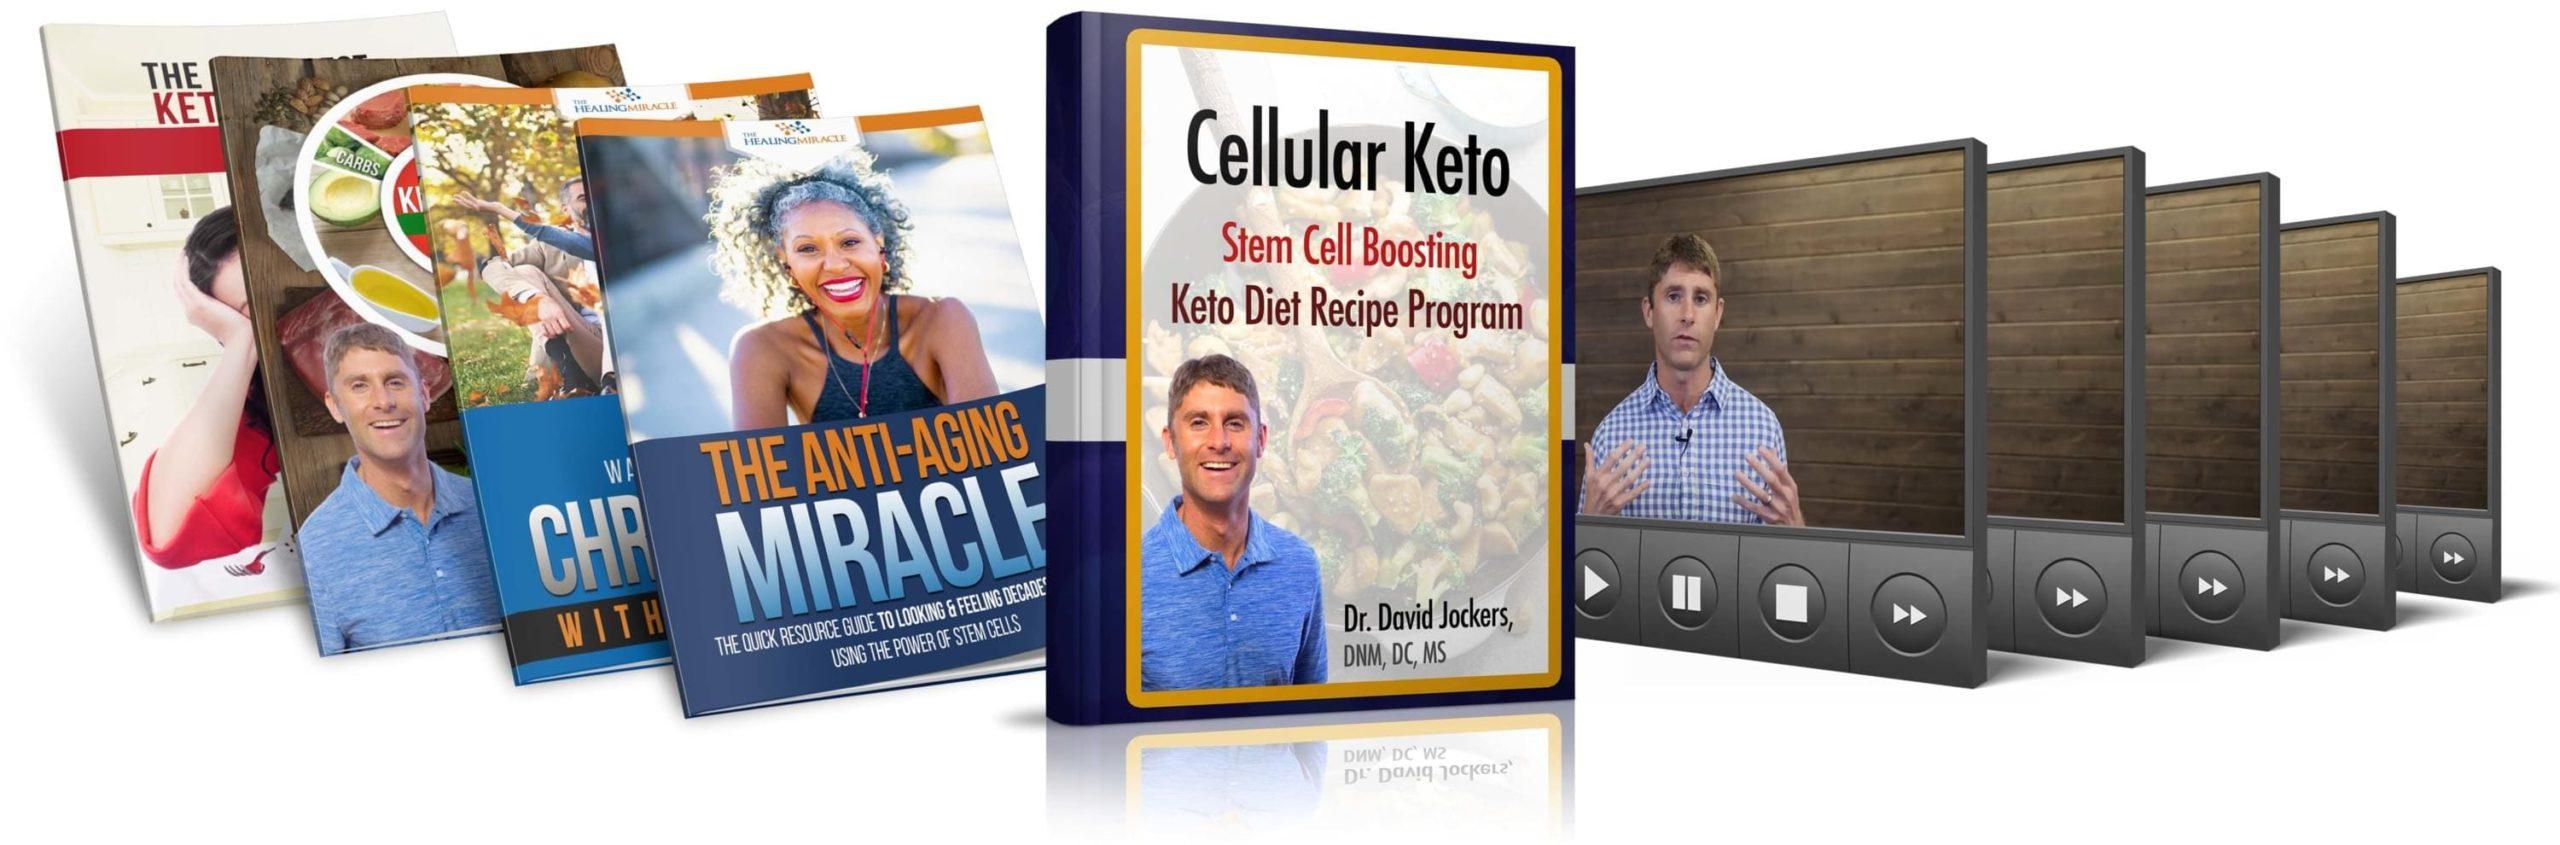 Cellular Keto Recipes